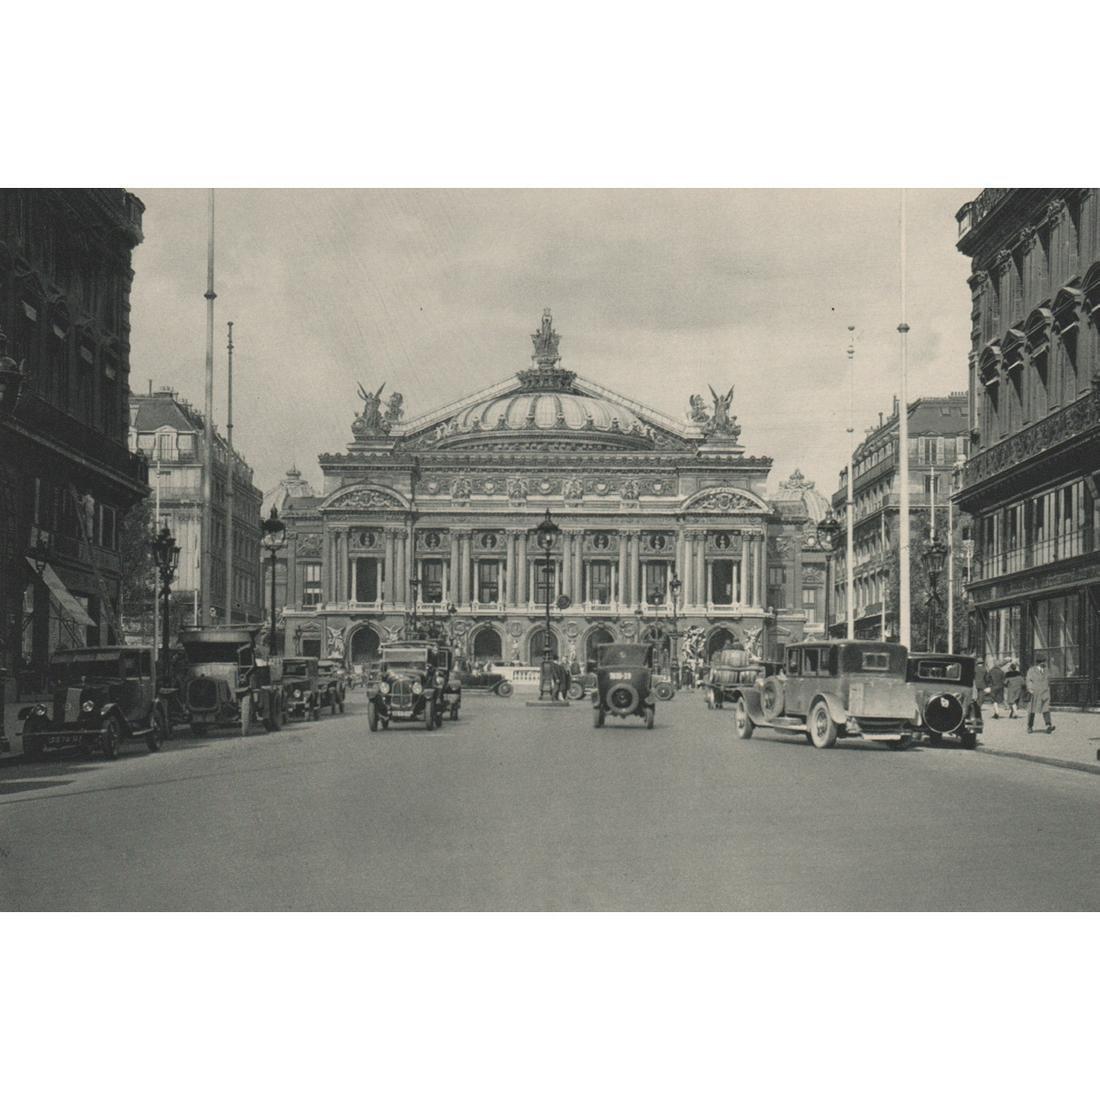 MARIO BUCOVICH - Opera House, Paris